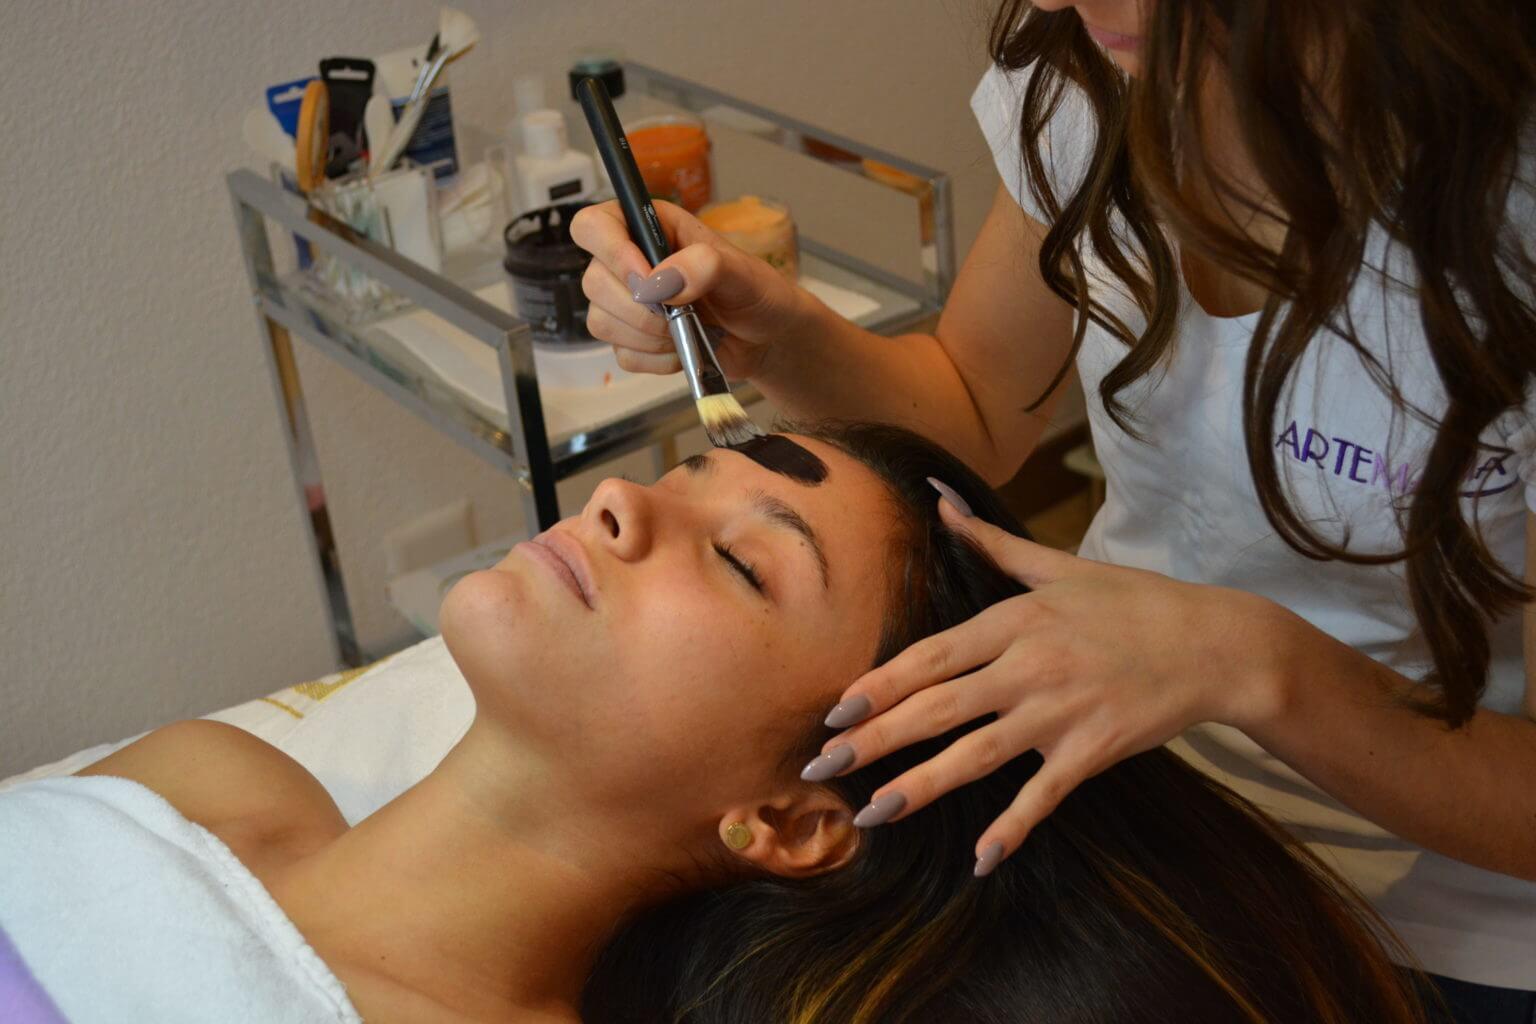 Gesichtsbehandlung - Kosmetik Artemania Fehraltorf - Nail Art - Beauty und Care 1